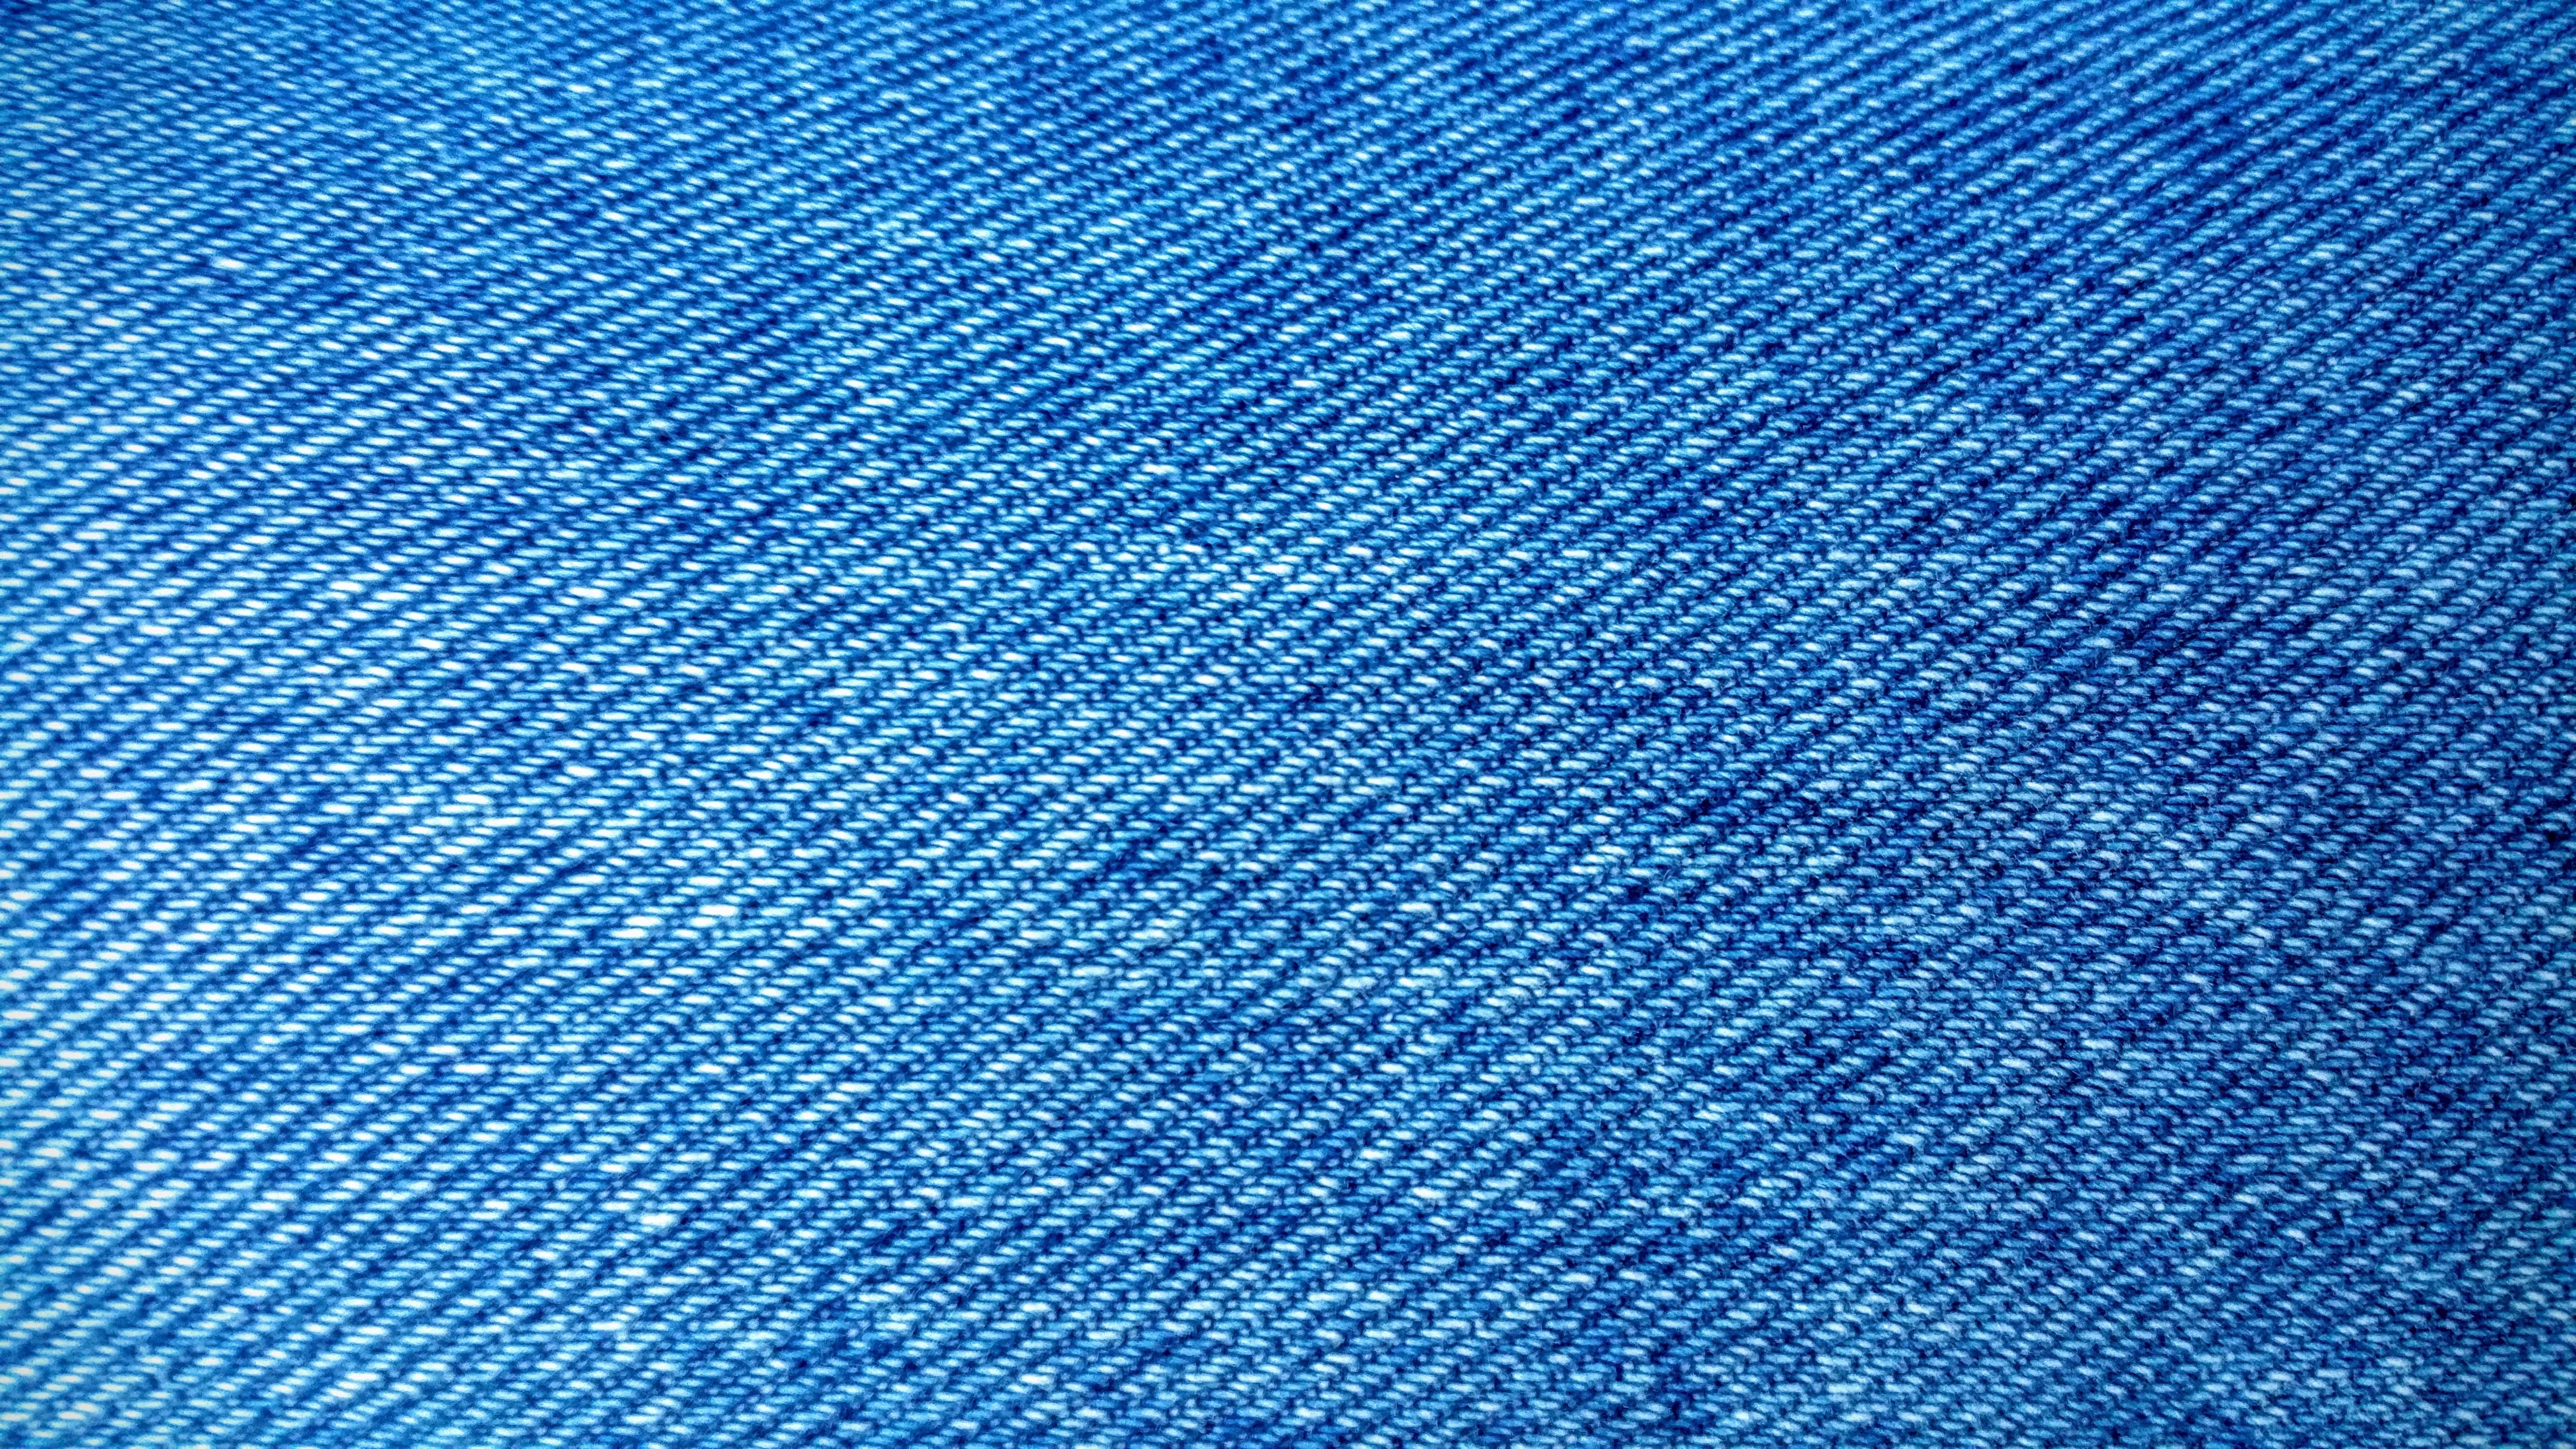 Kostenlose foto : Textur, Muster, Linie, Mode, blau, Material, Kreis ...